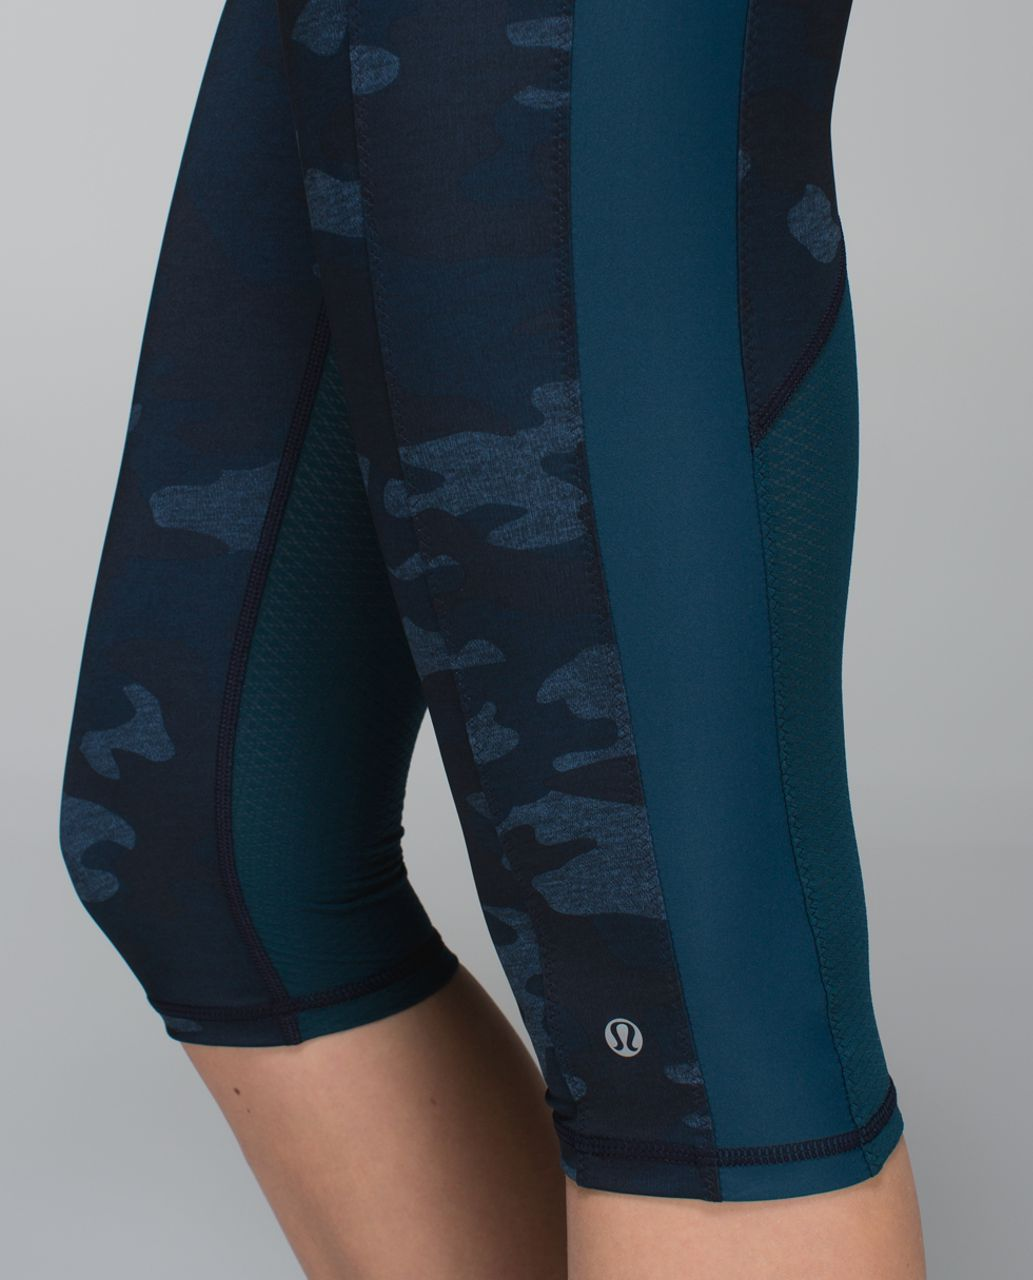 Lululemon Clip-In Crop - Heathered Texture Lotus Camo Oil Slick Blue / Alberta Lake